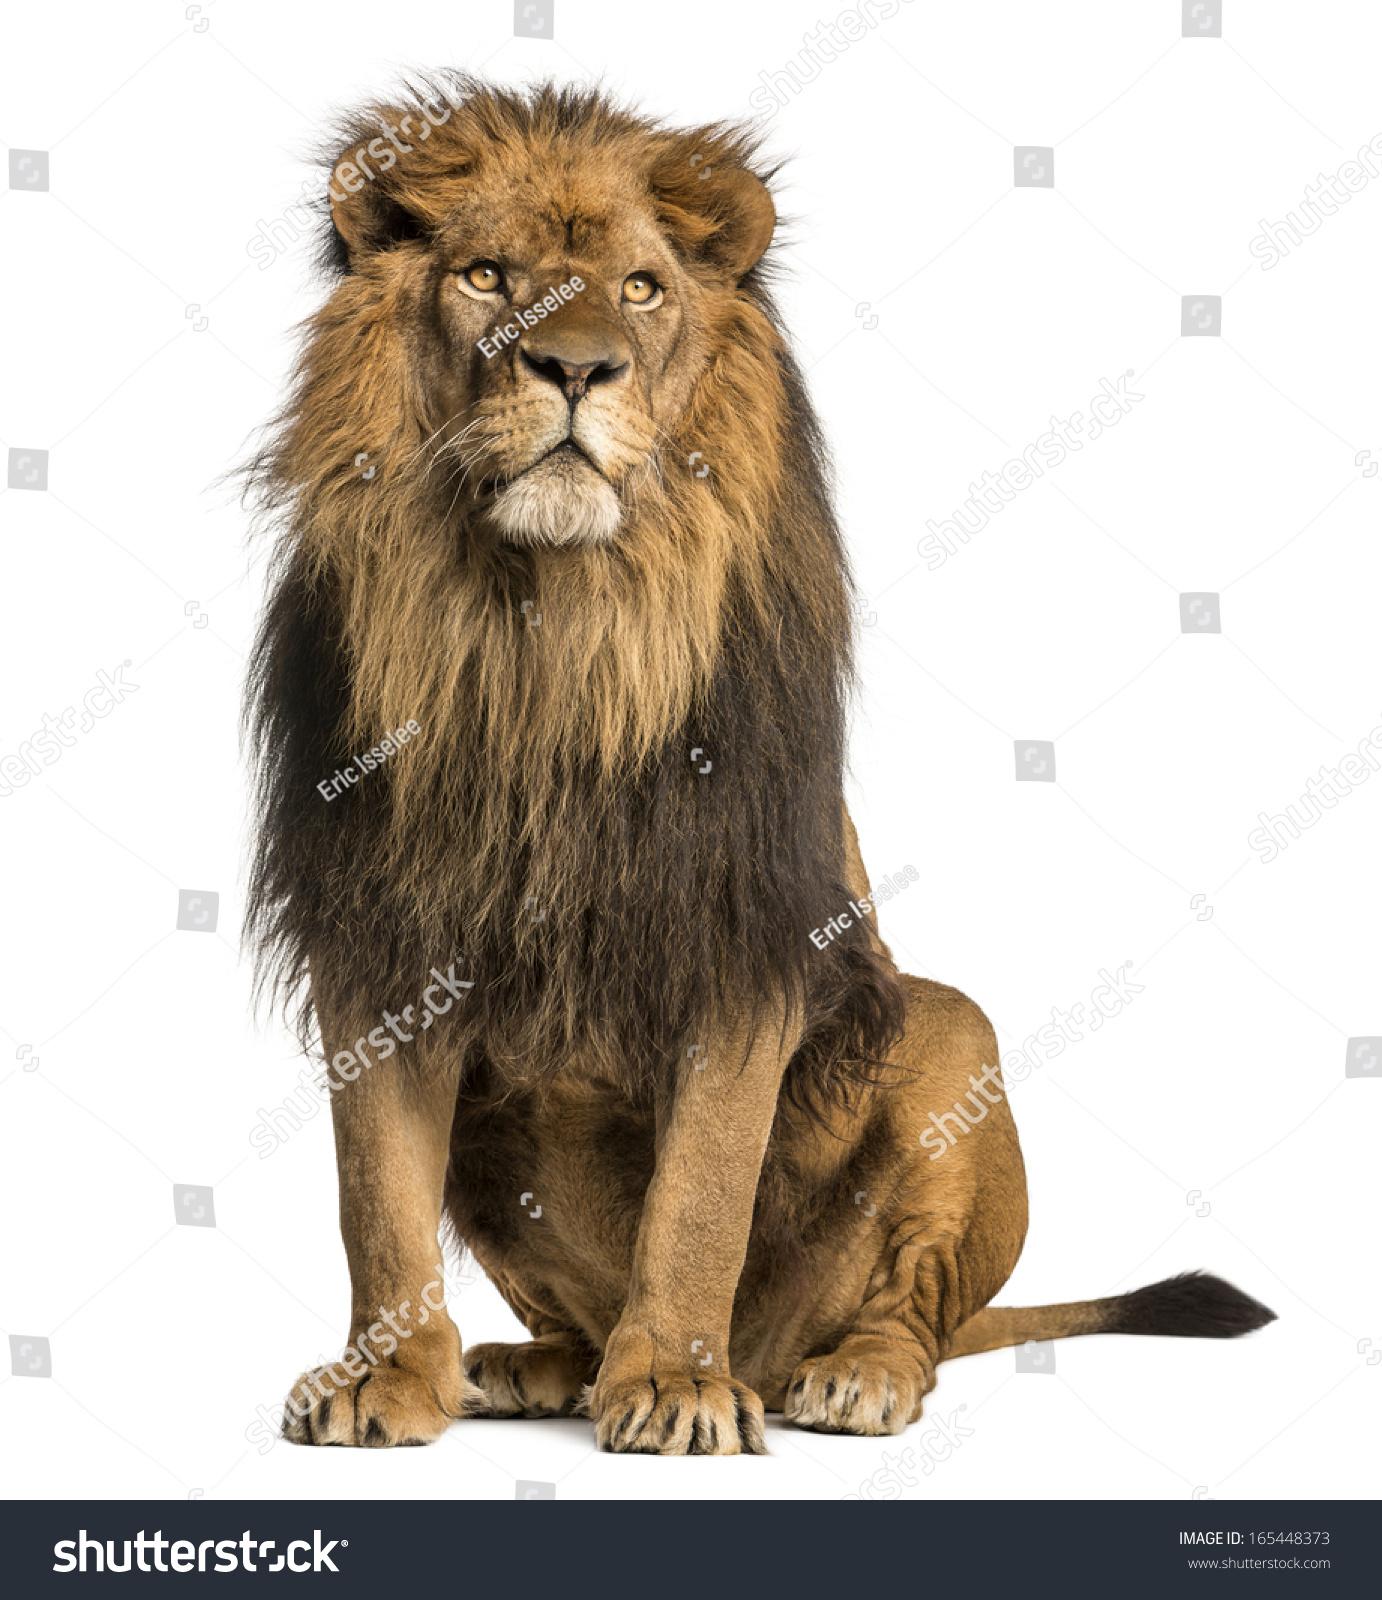 Lion sitting profile - photo#16